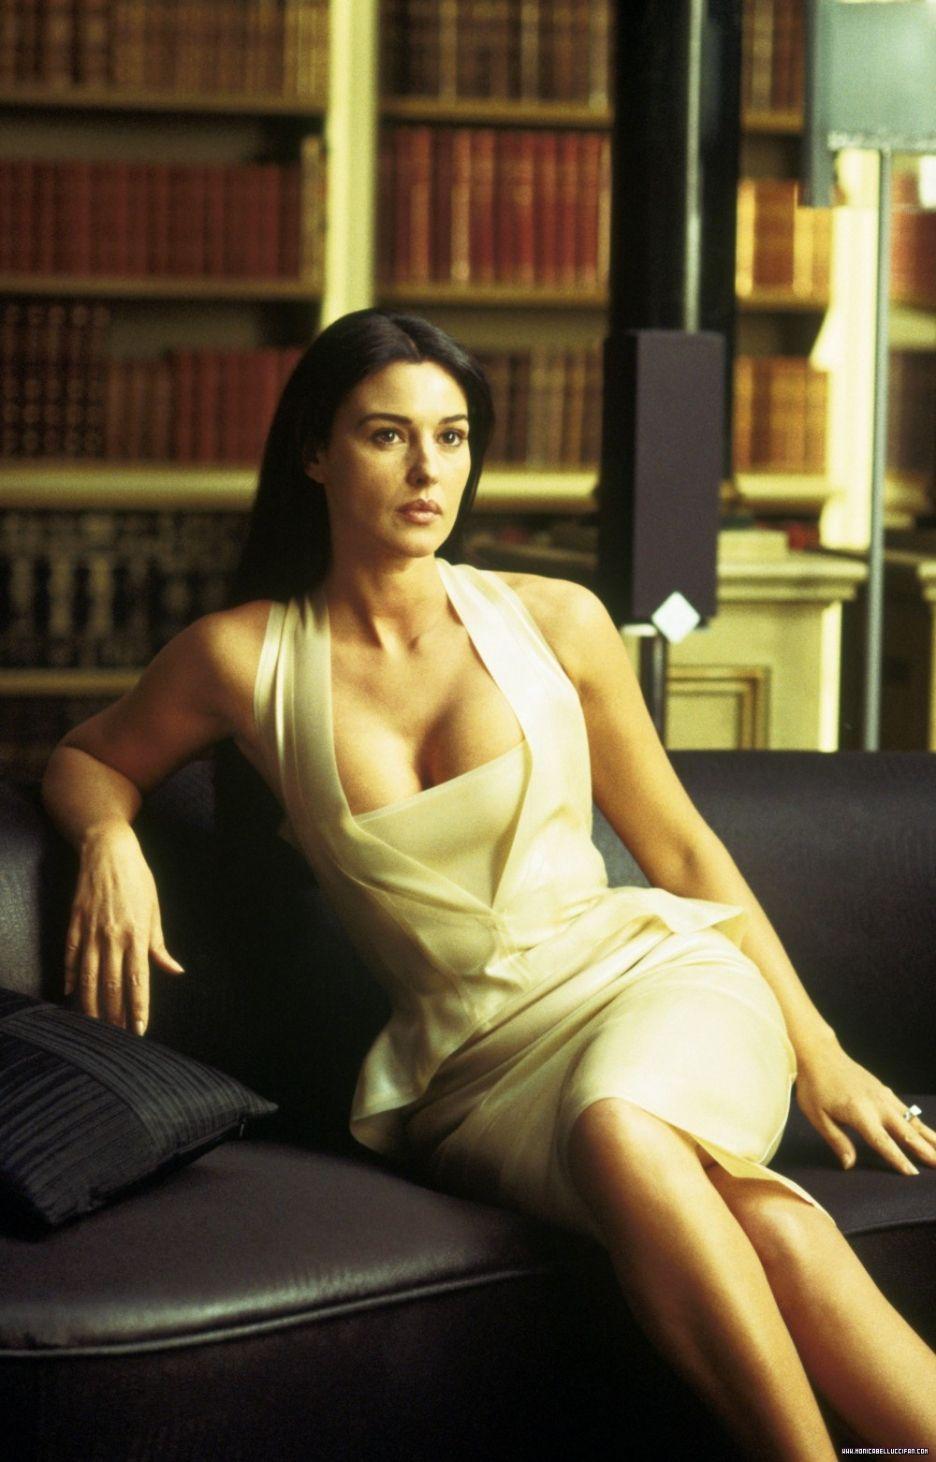 Monica bellucci hot matrix of dating